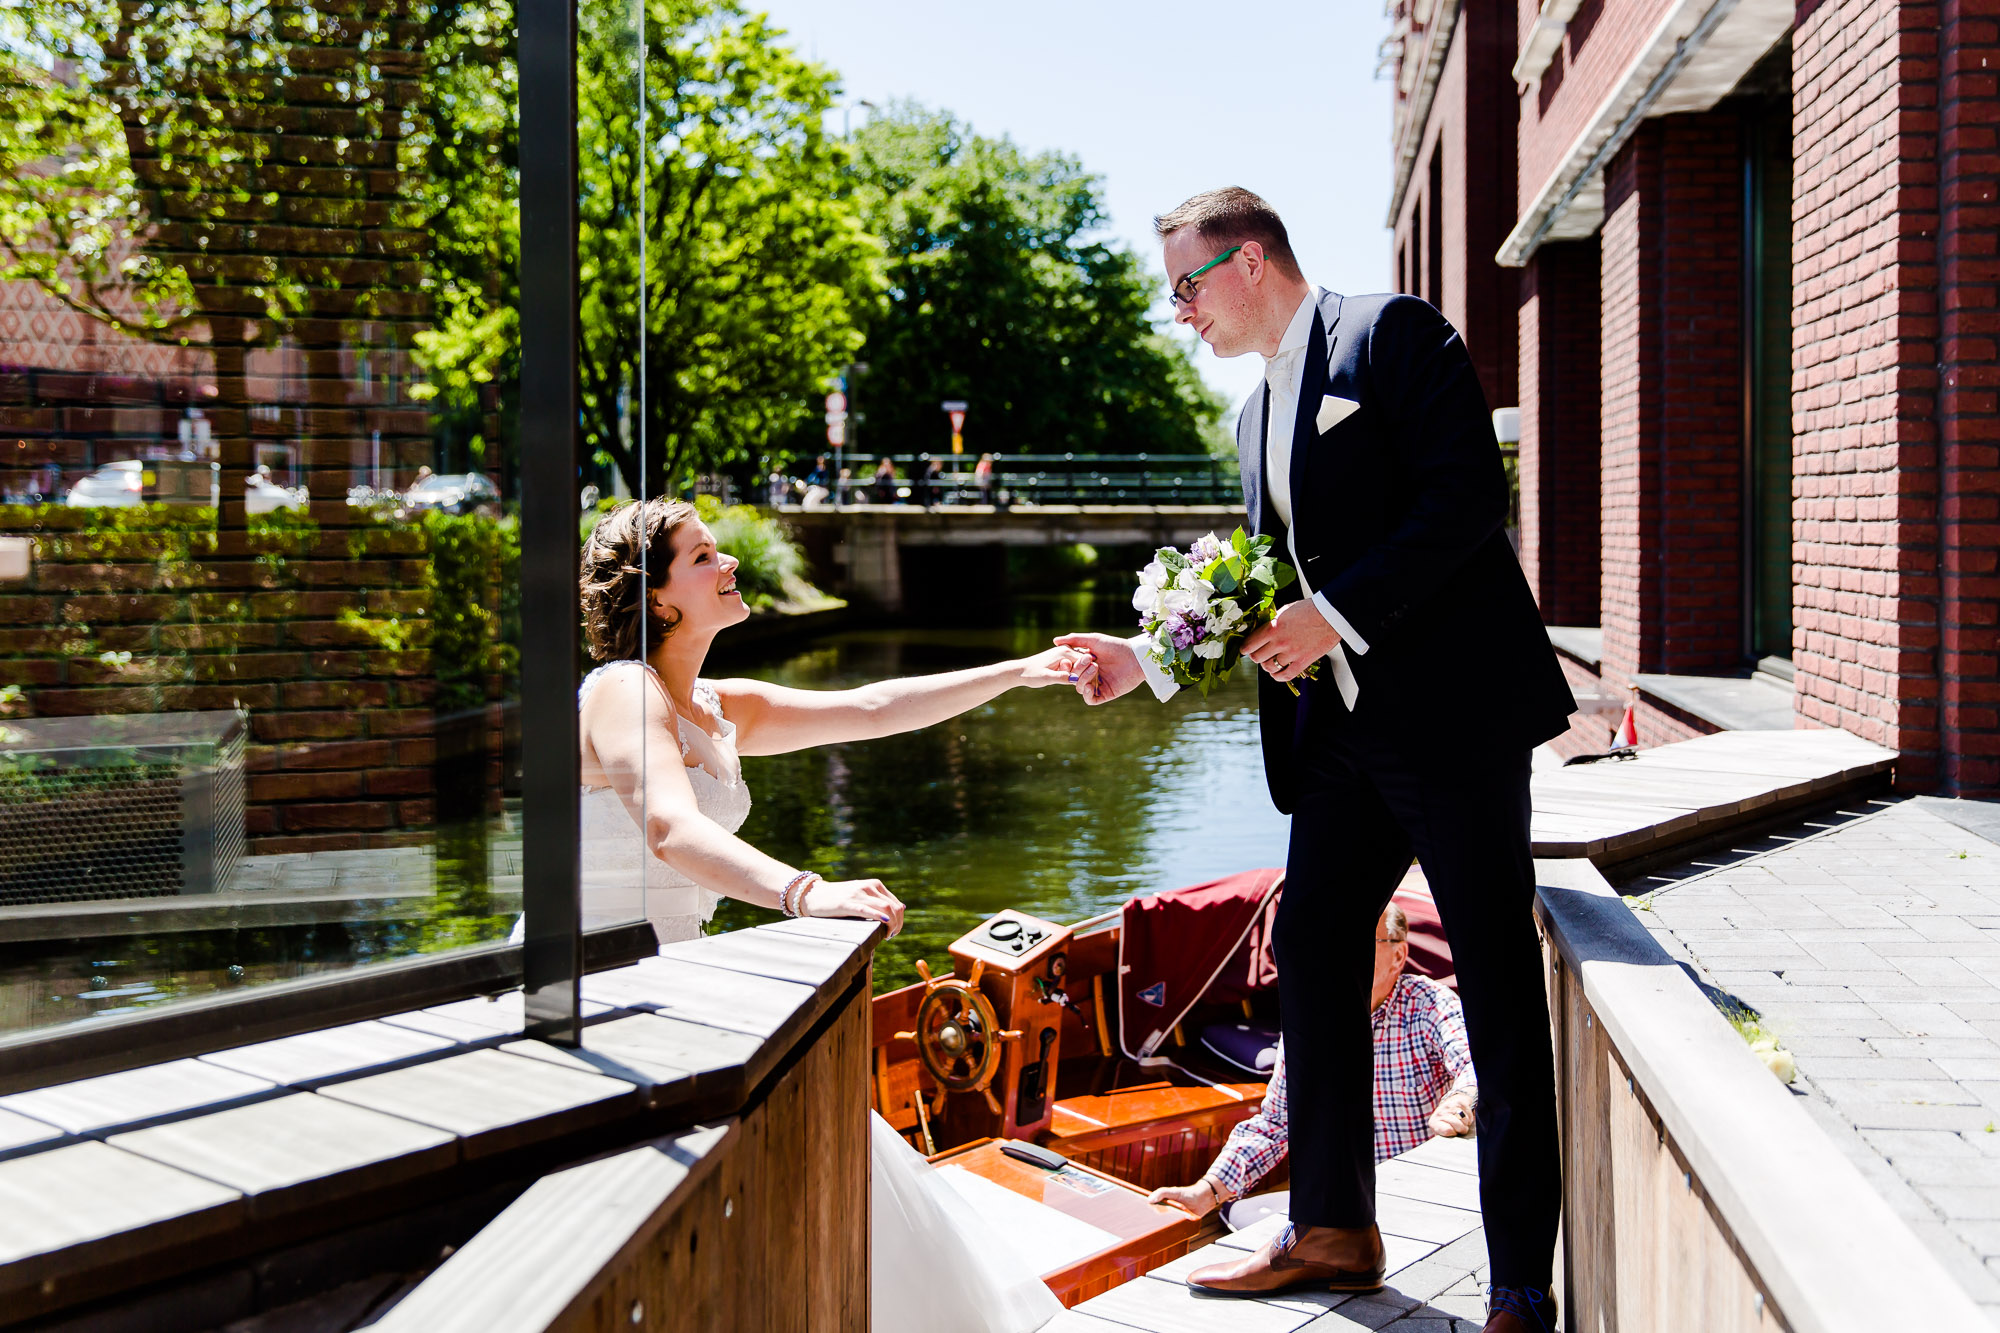 Bruiloft bij Hilton The Hague